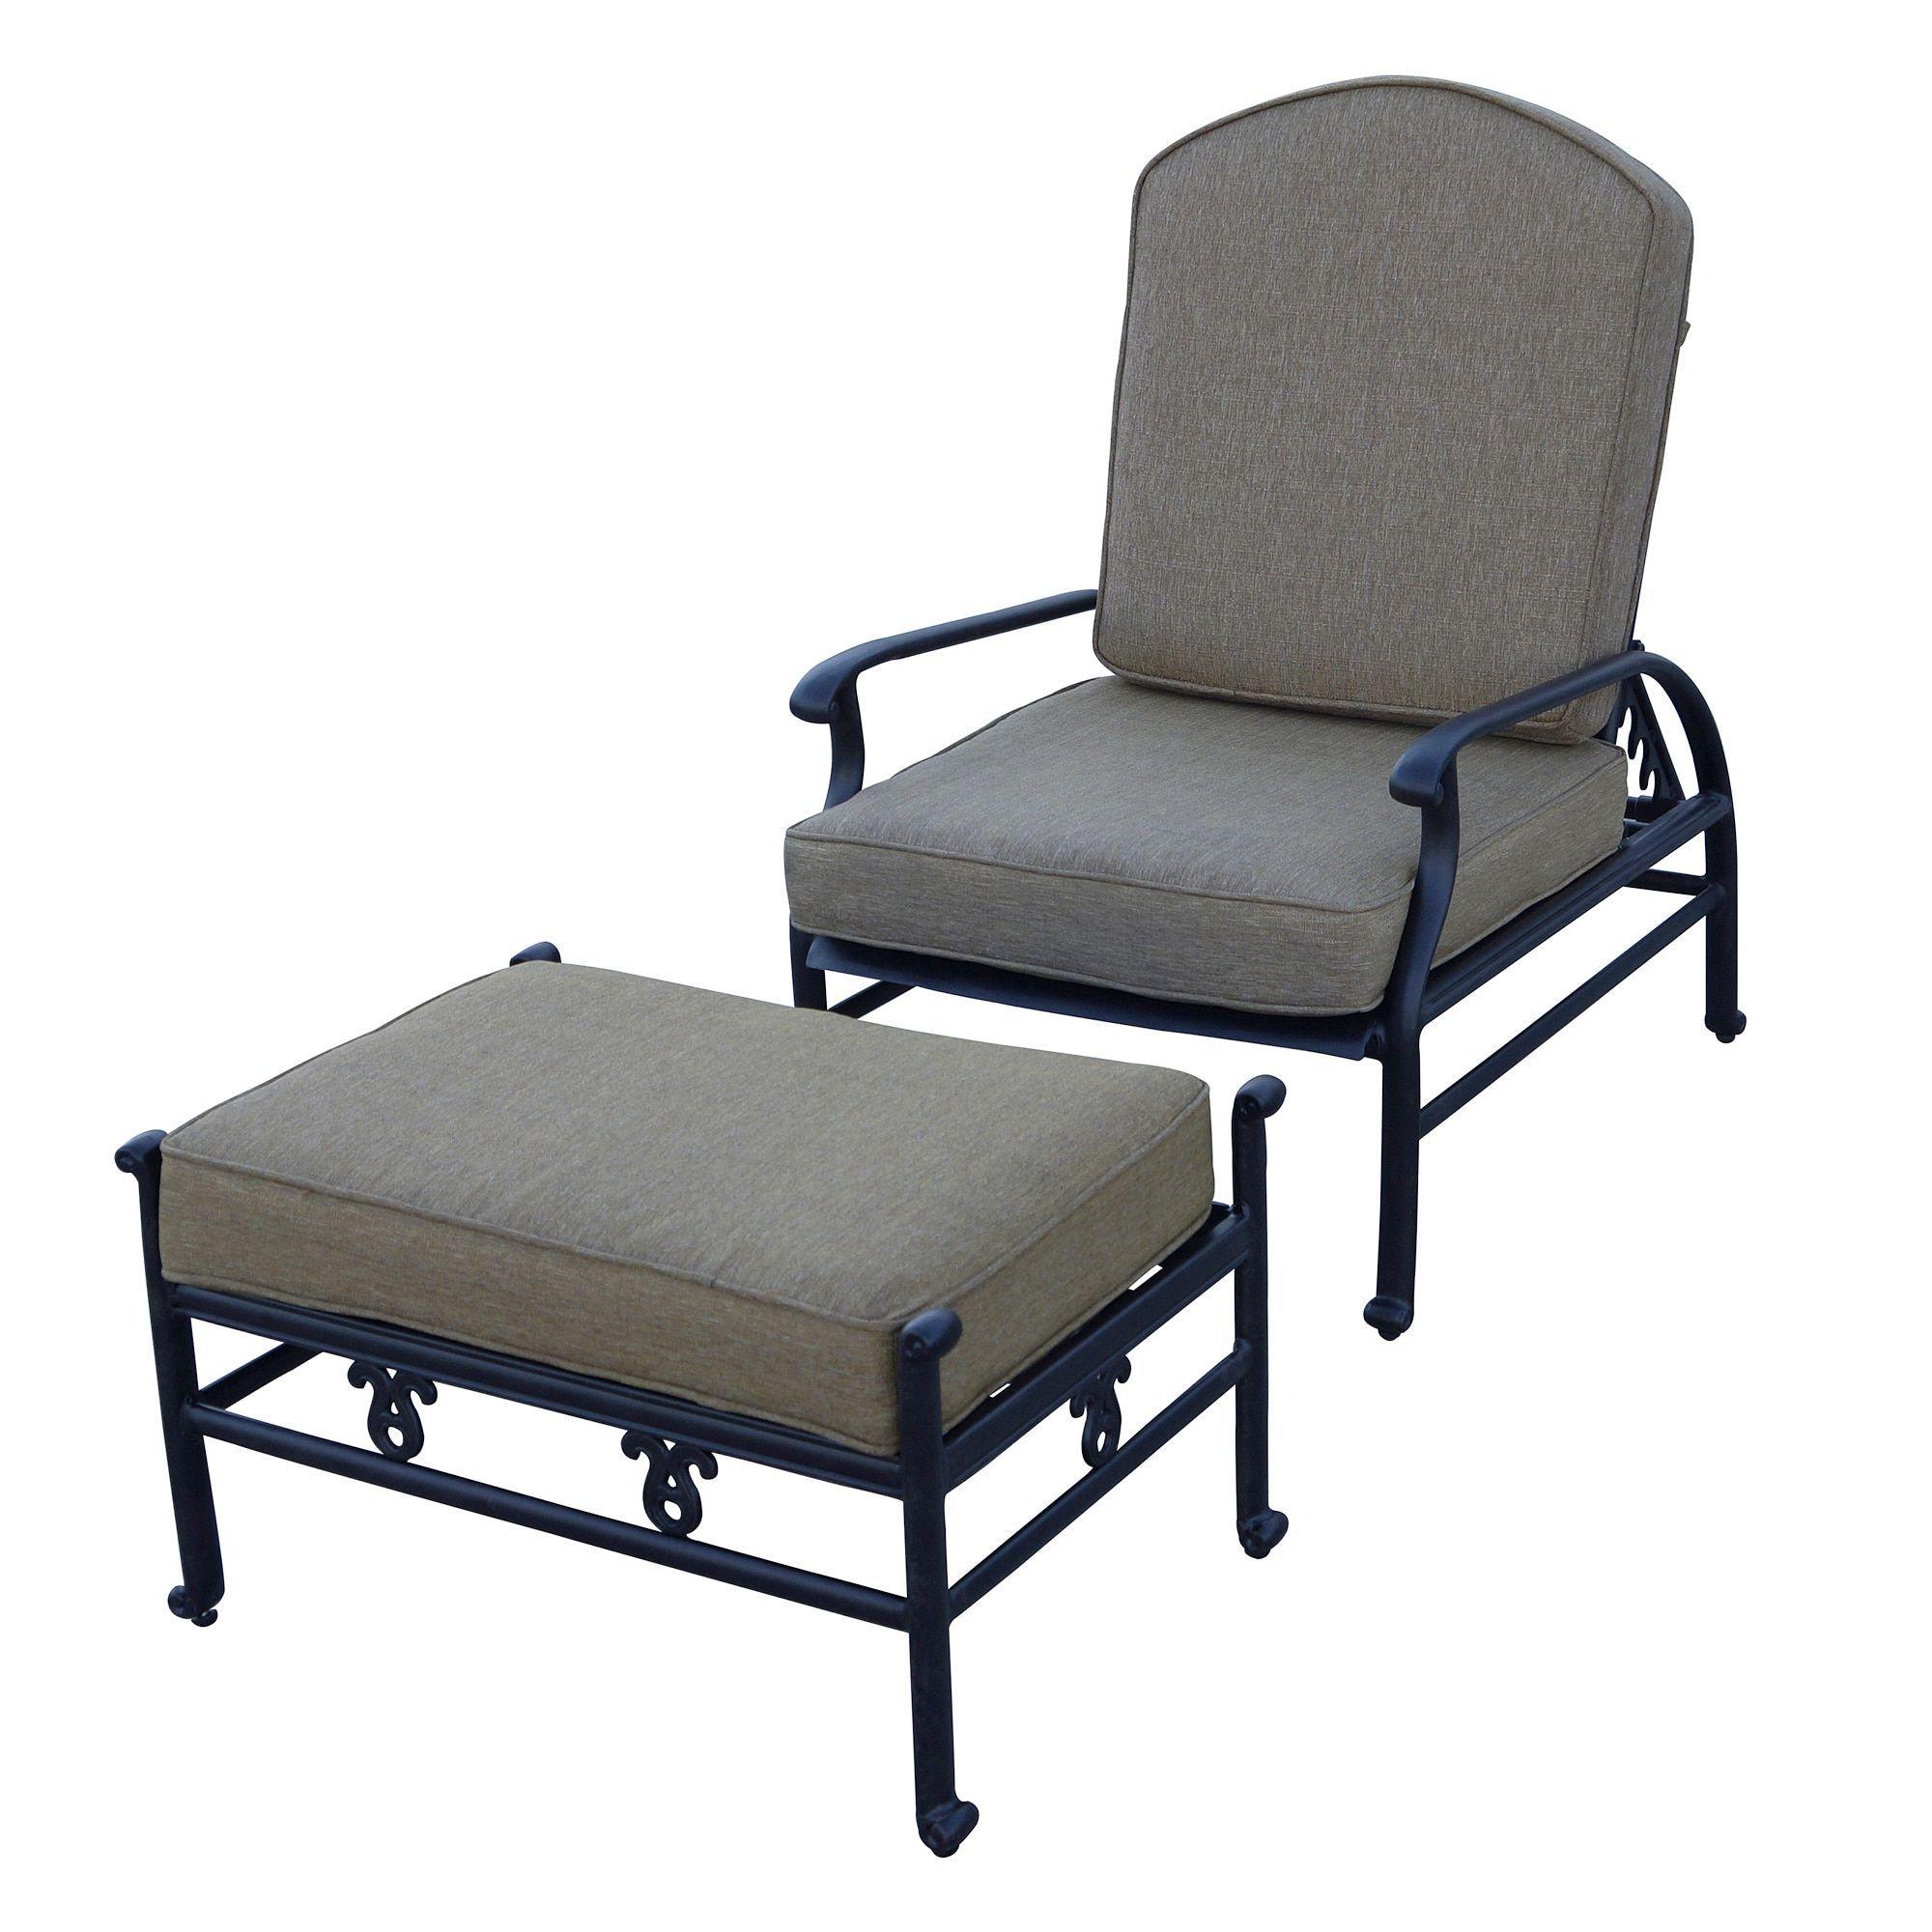 Fabulous Darlee Catalina Cast Aluminum Adjustable Cushioned Club Machost Co Dining Chair Design Ideas Machostcouk